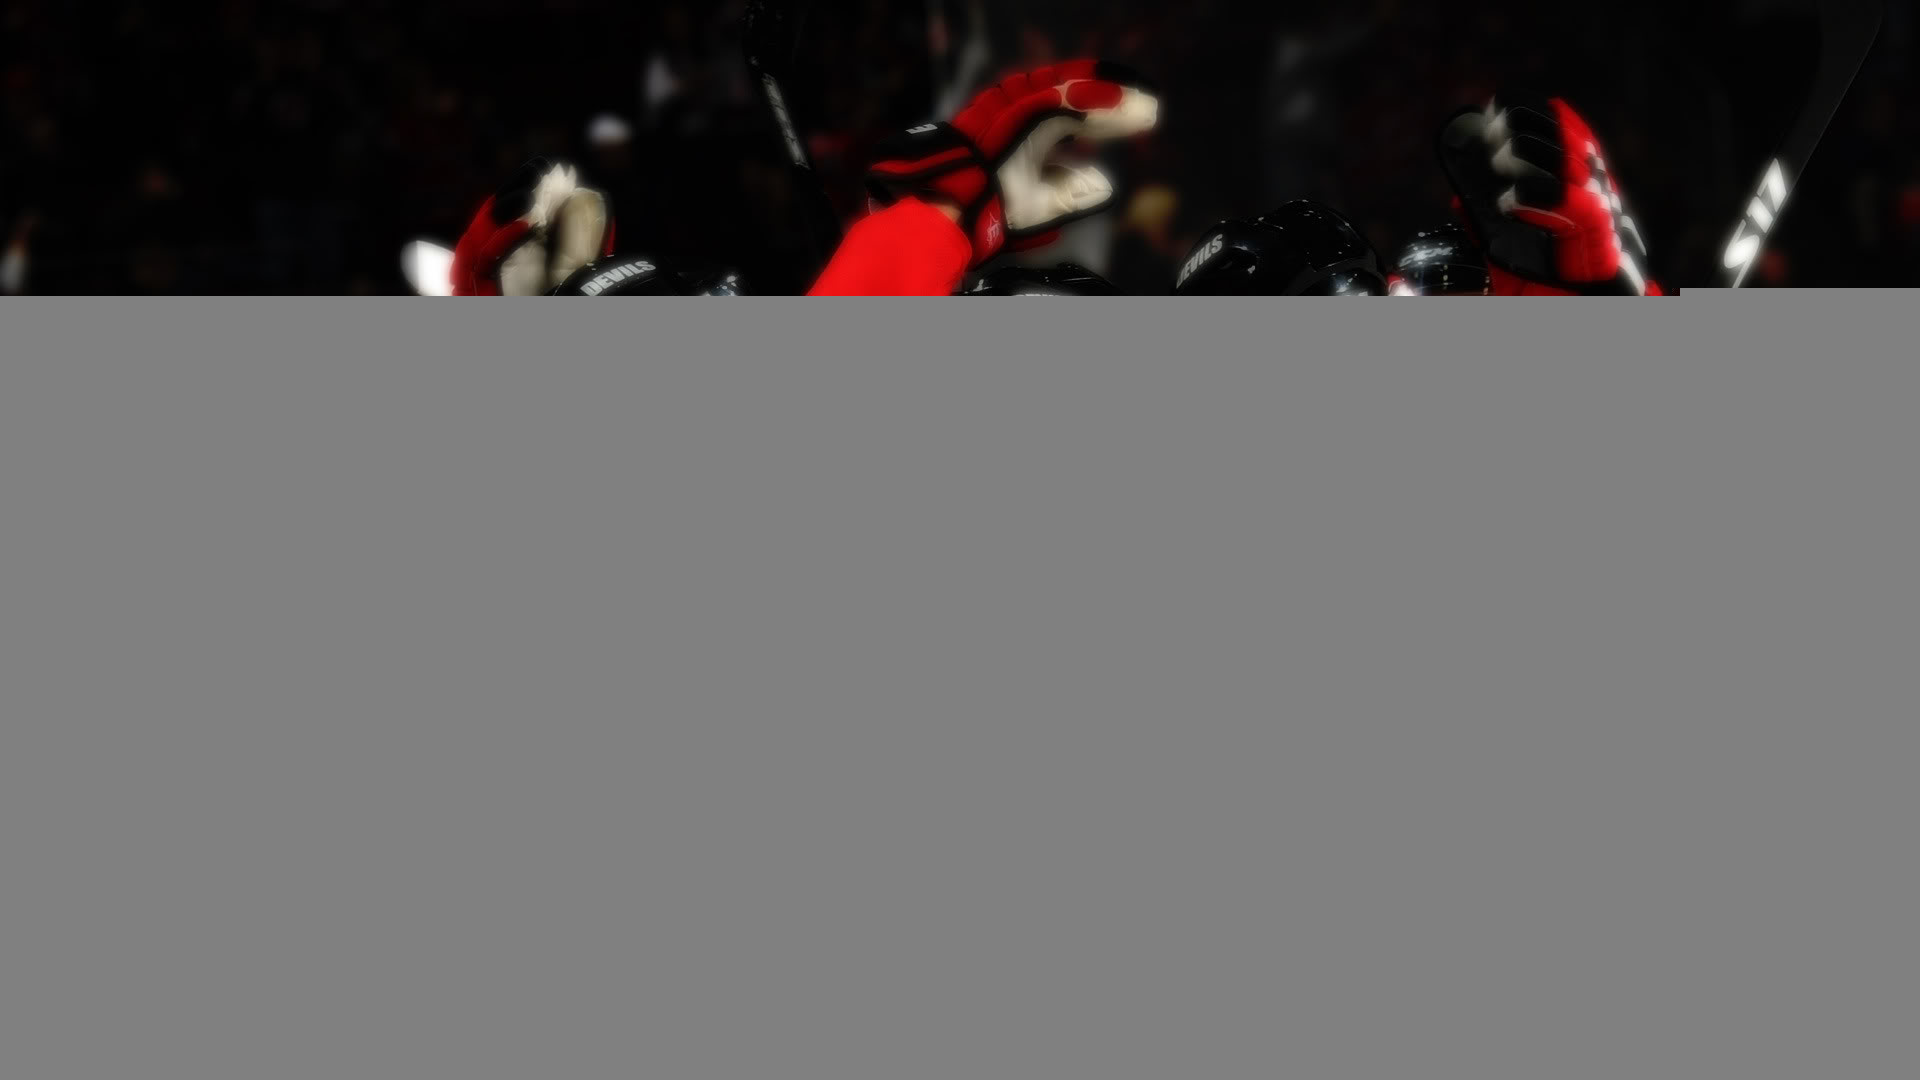 HD Nhl New Jersey Devils Paper Supply Devilslegion Replay Until Could  Wallpaper